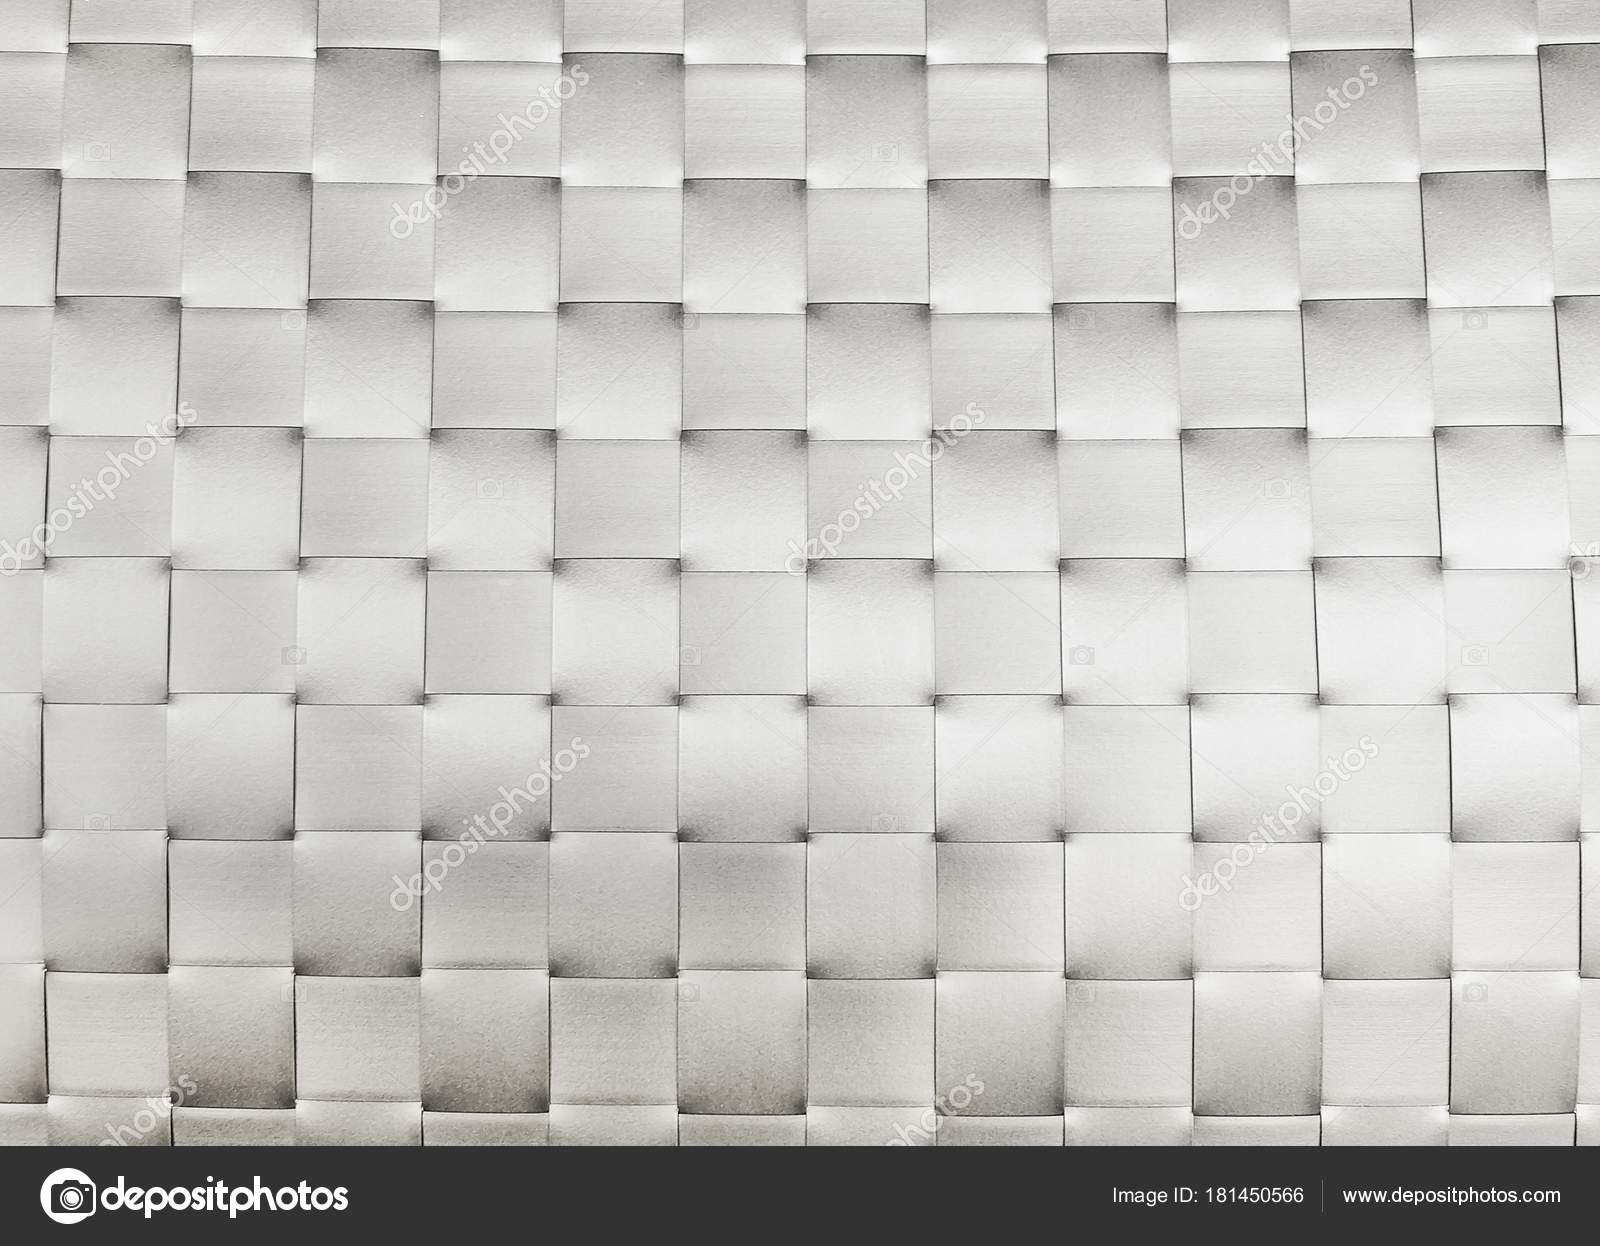 Patrón Fondo Plata Plástico Tejido Superficie Mimbre Textura Malla ...